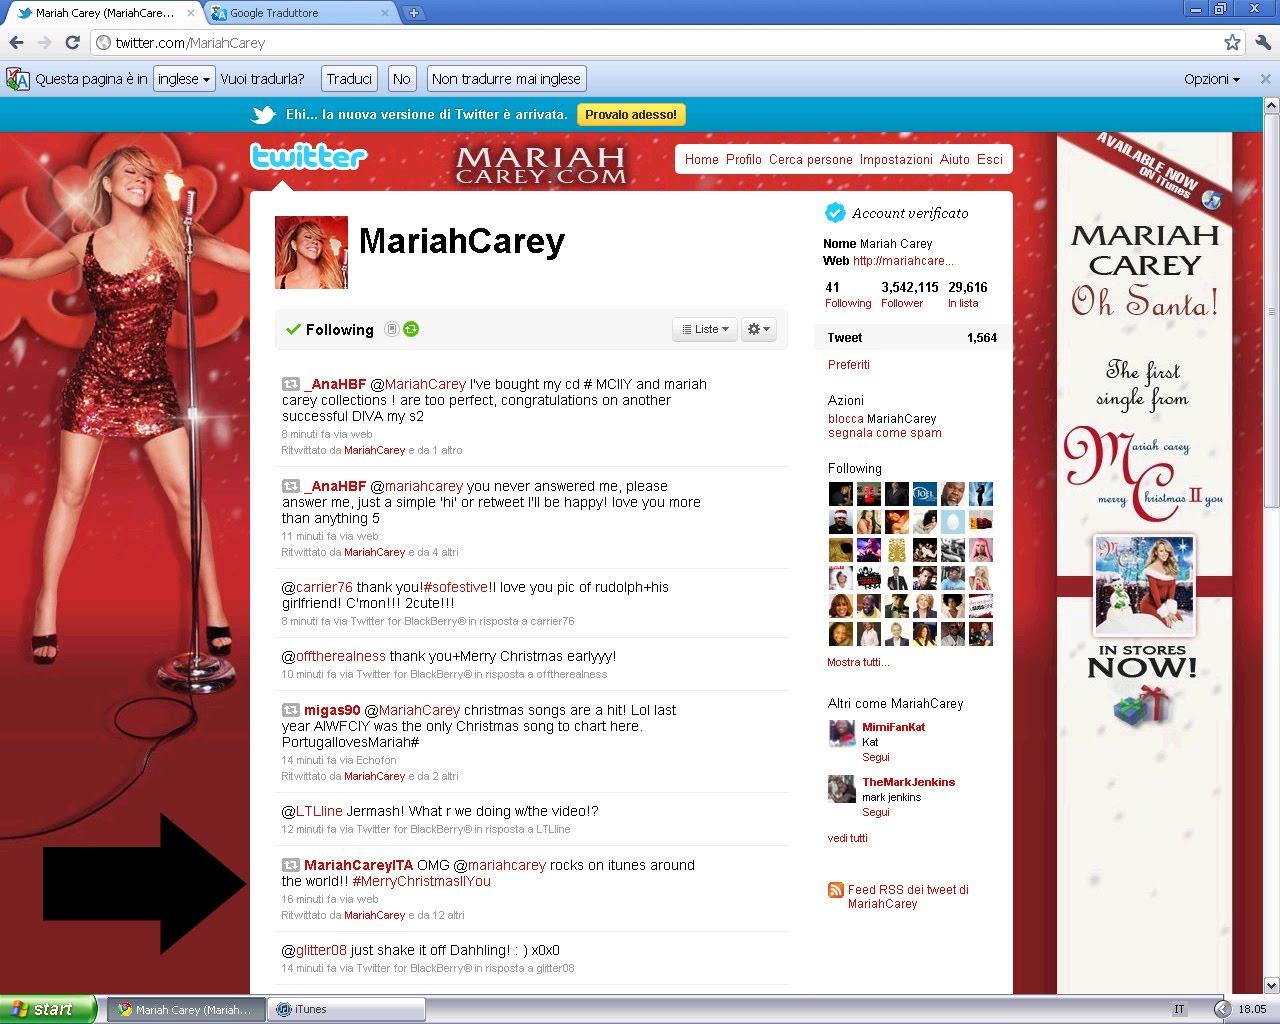 http://1.bp.blogspot.com/_3Nj5I42VdDA/TQKAjy-506I/AAAAAAAACwk/jJjJZWXbiv0/s1600/mariah%2Bcarey%2Btwitter.jpg